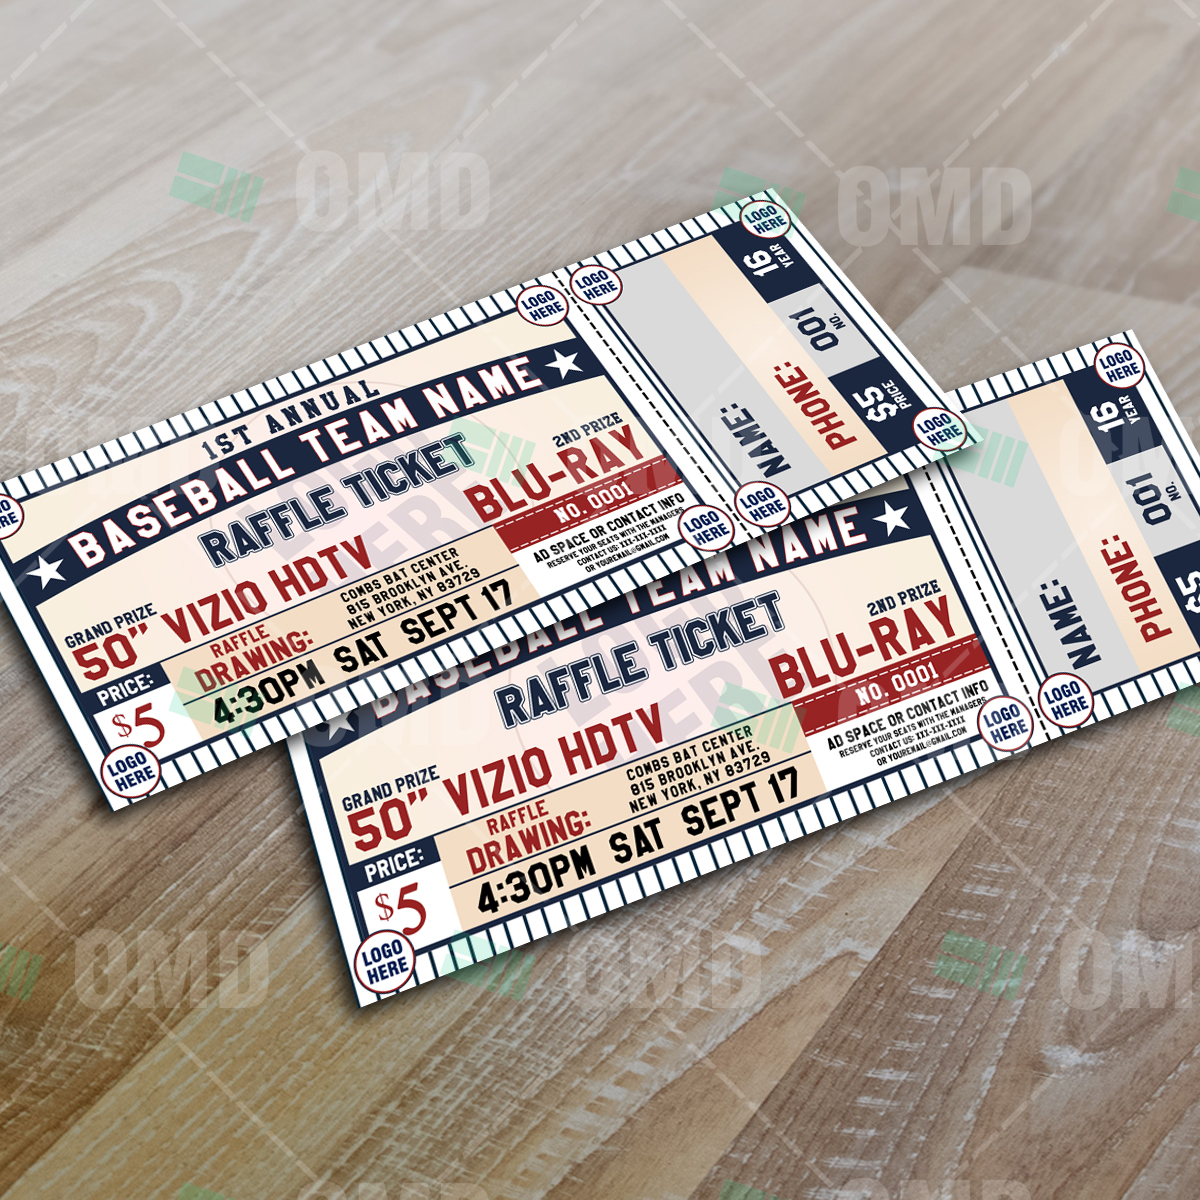 Classic Baseball Raffle Ticket Template